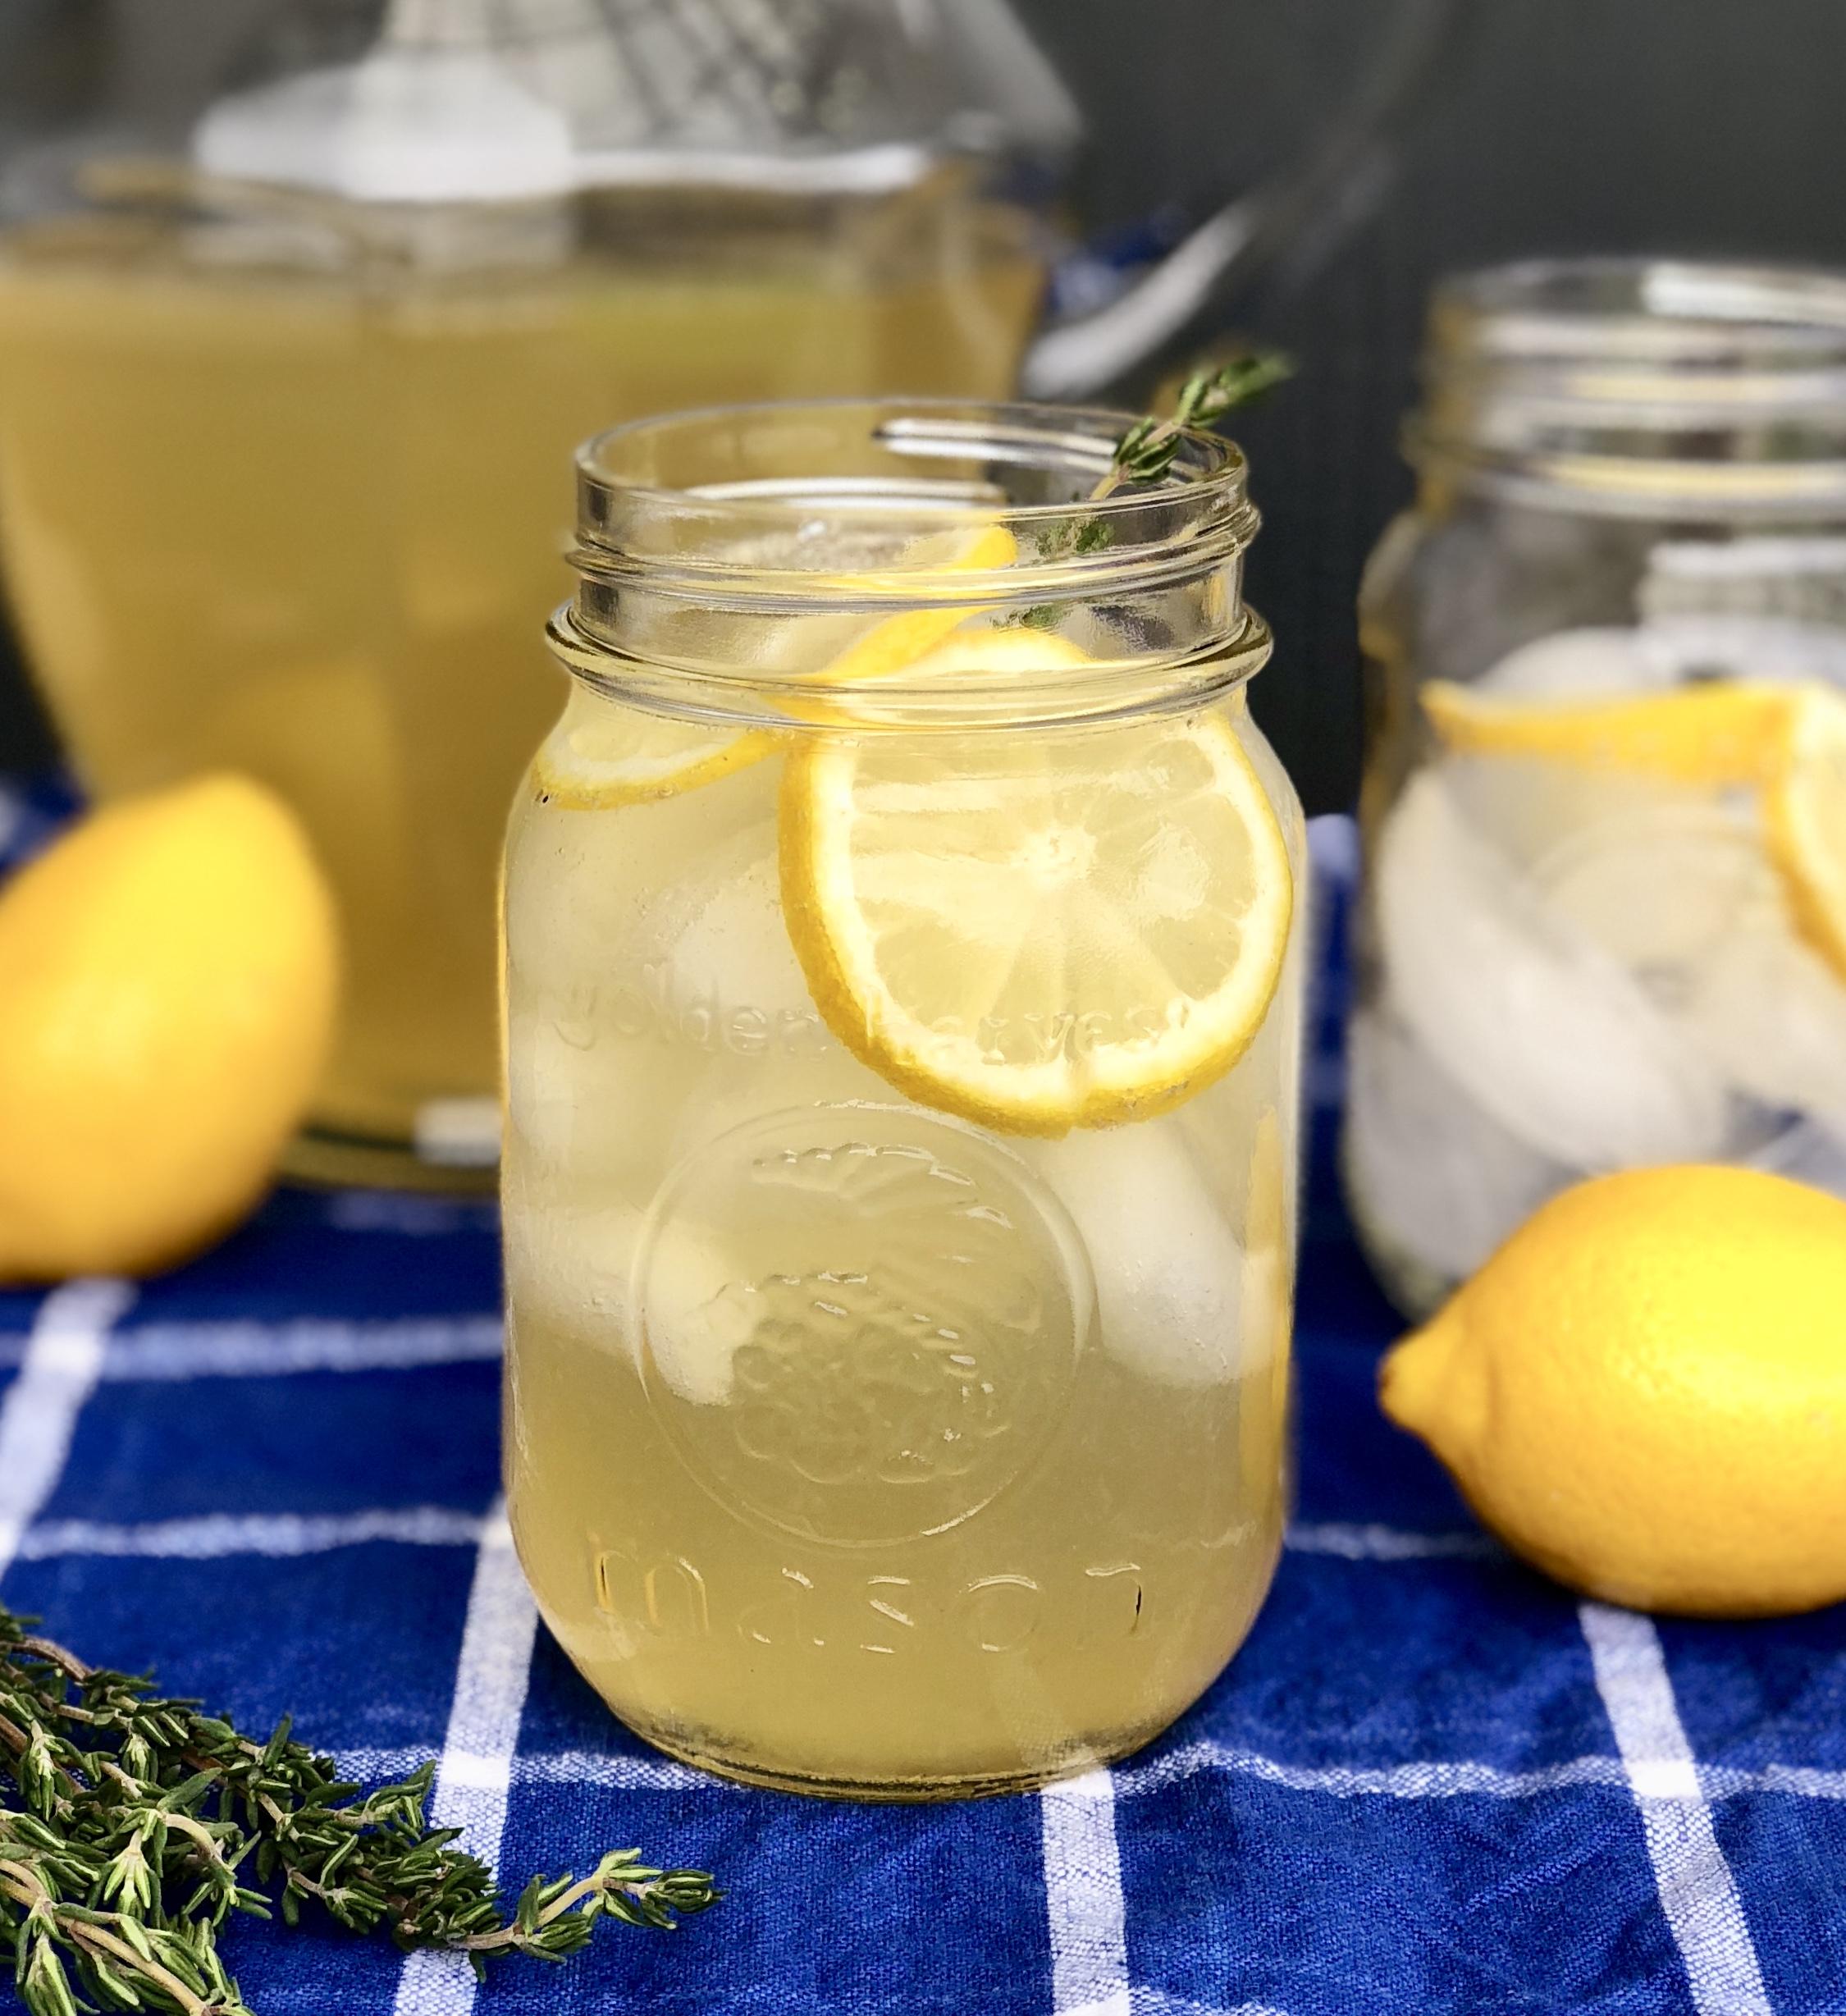 Grilled Lemon and Thyme Lemonade